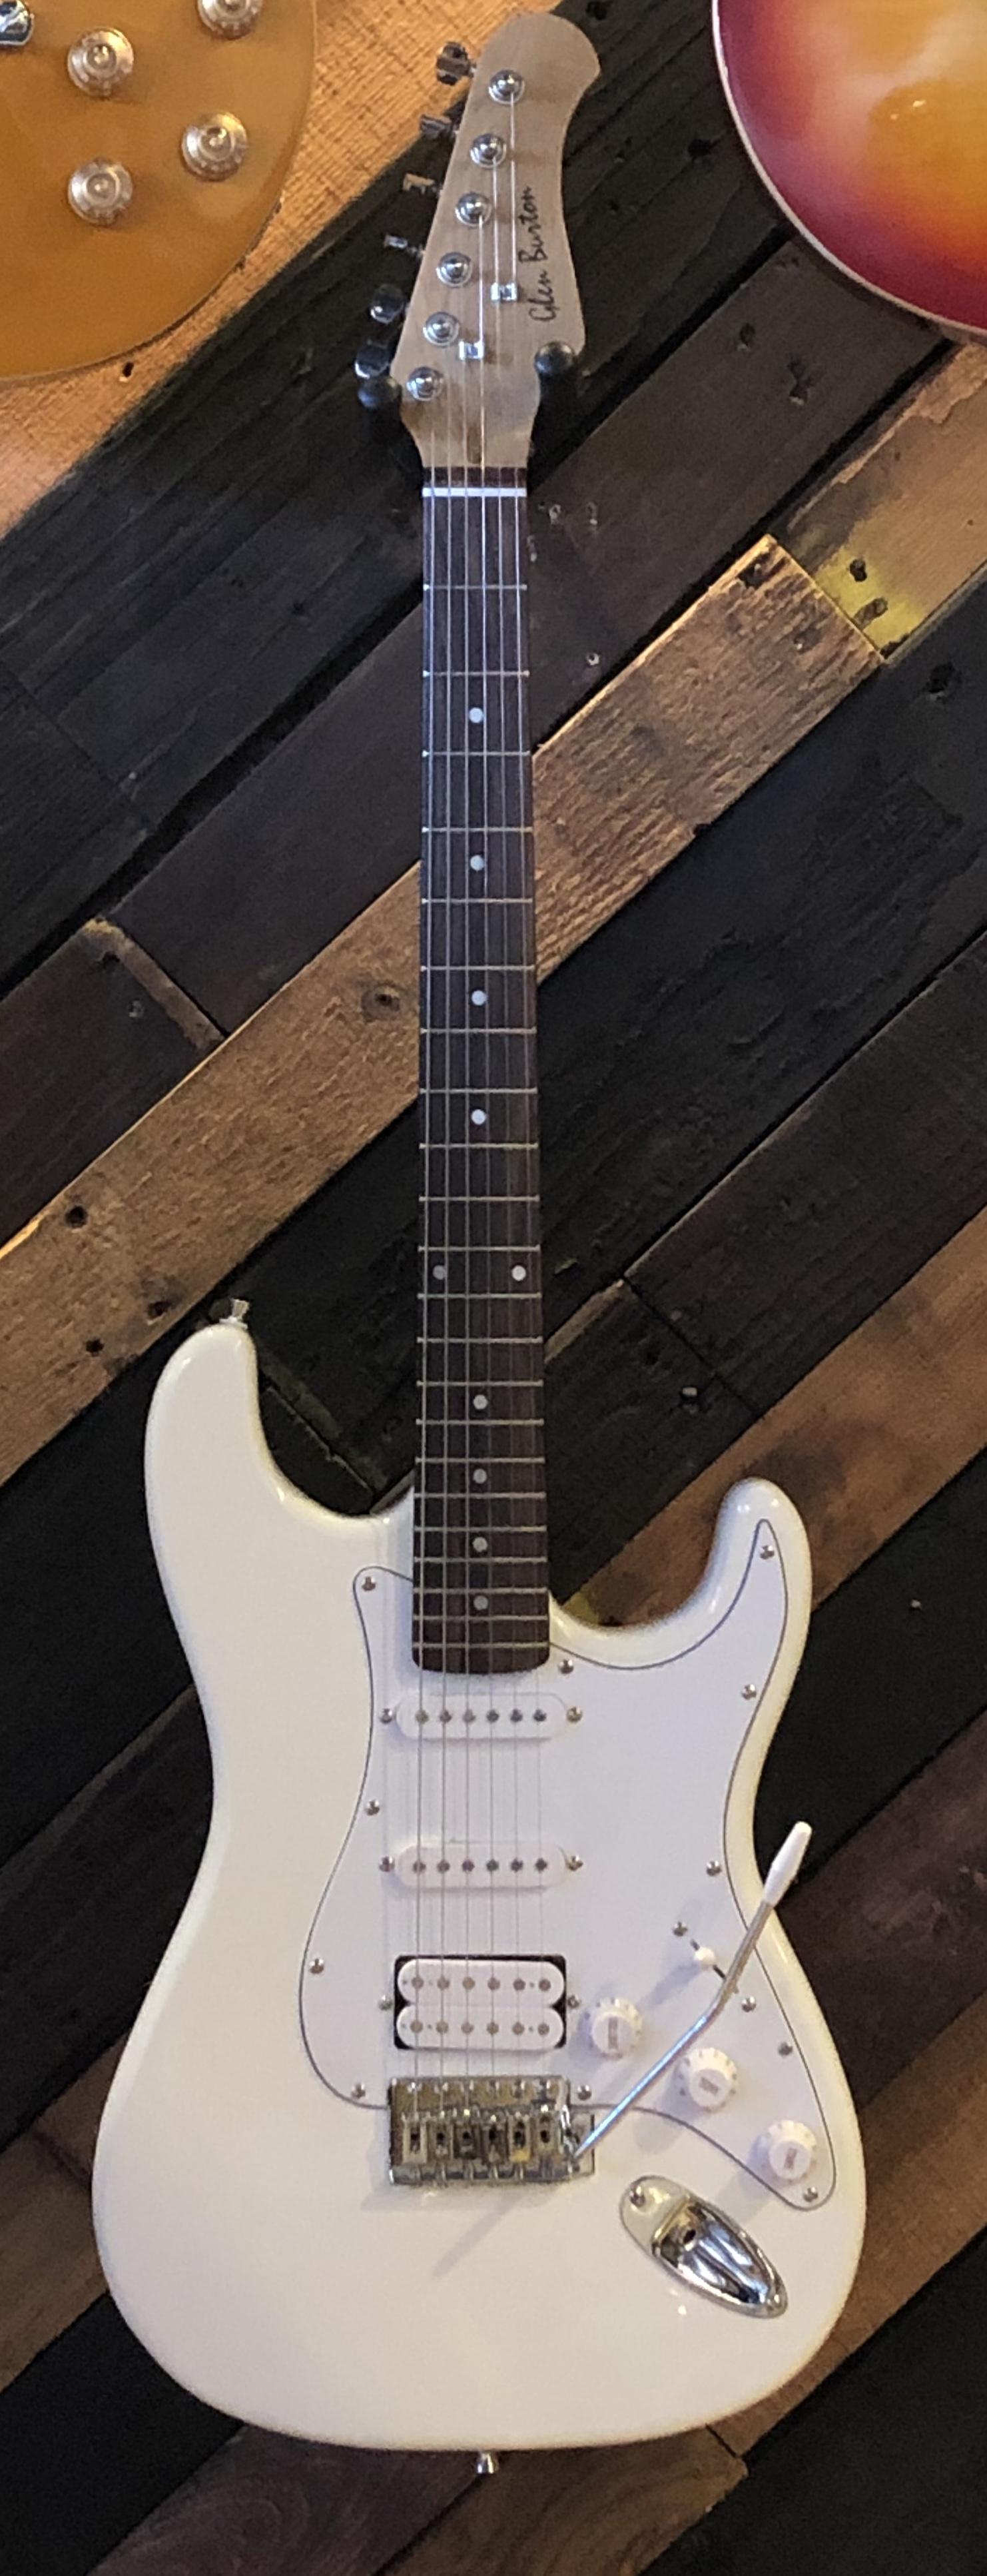 Glen Burton GE39-ST101-WH Solid Body S-Type Electric Guitar w/ Slipcase